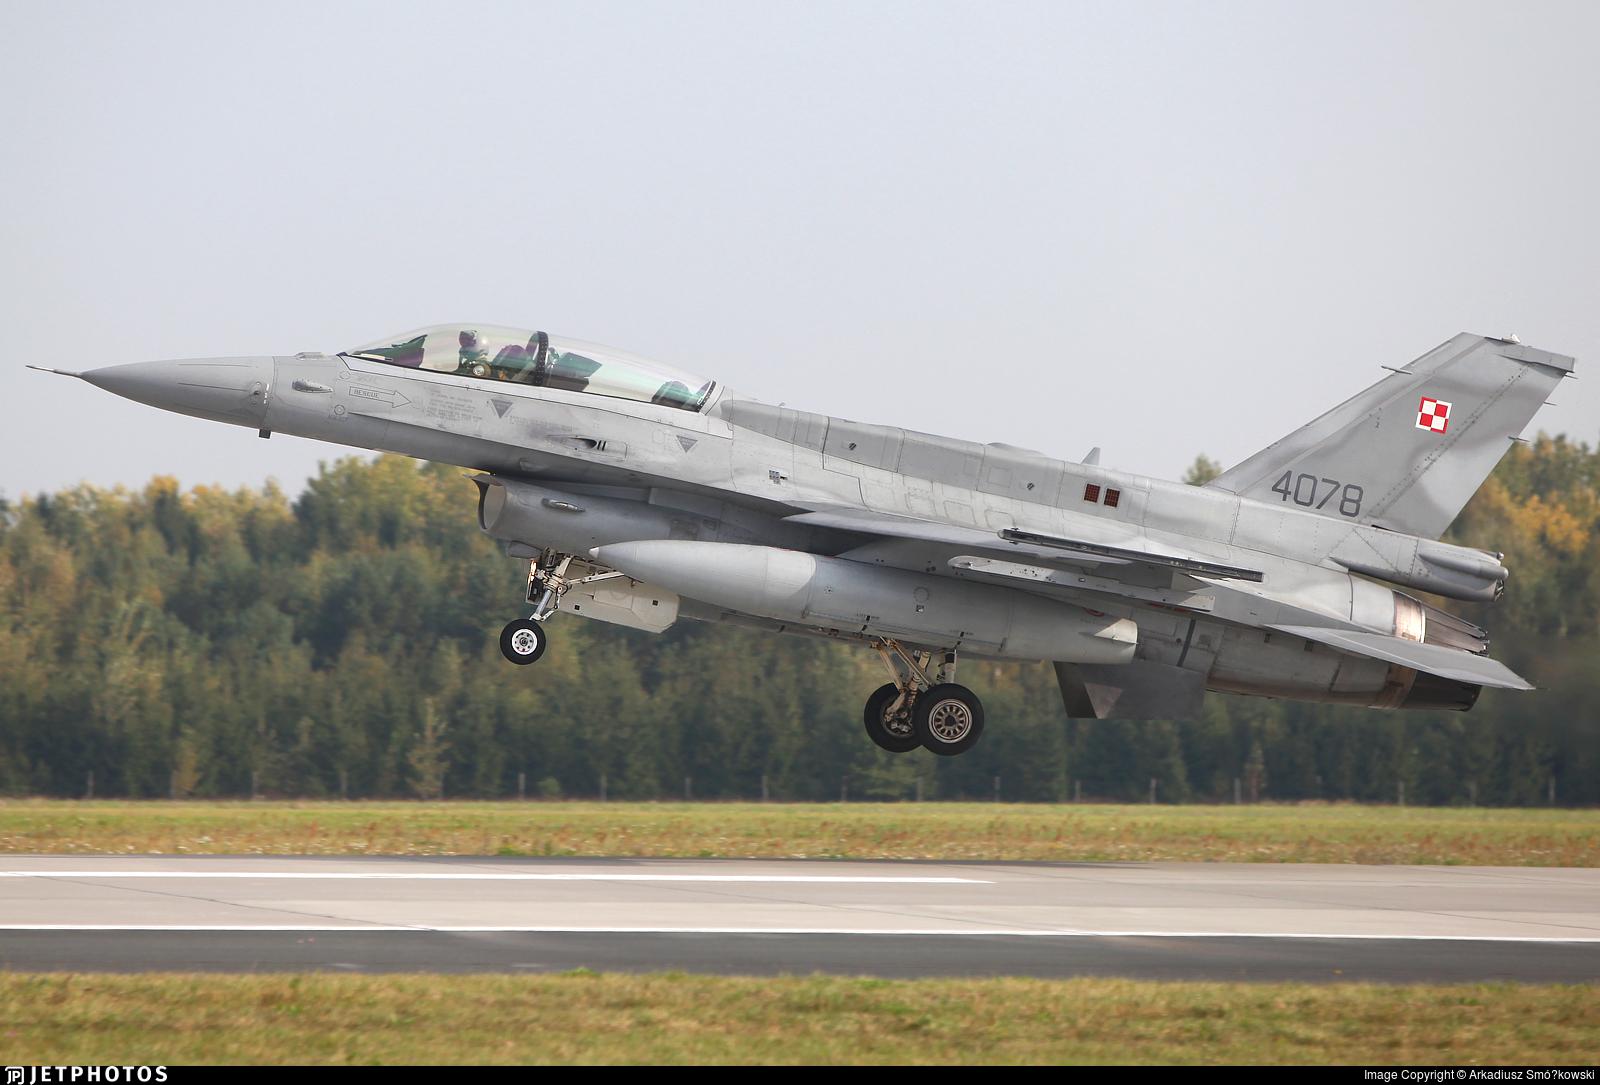 4078 - Lockheed Martin F-16D Fighting Falcon - Poland - Air Force